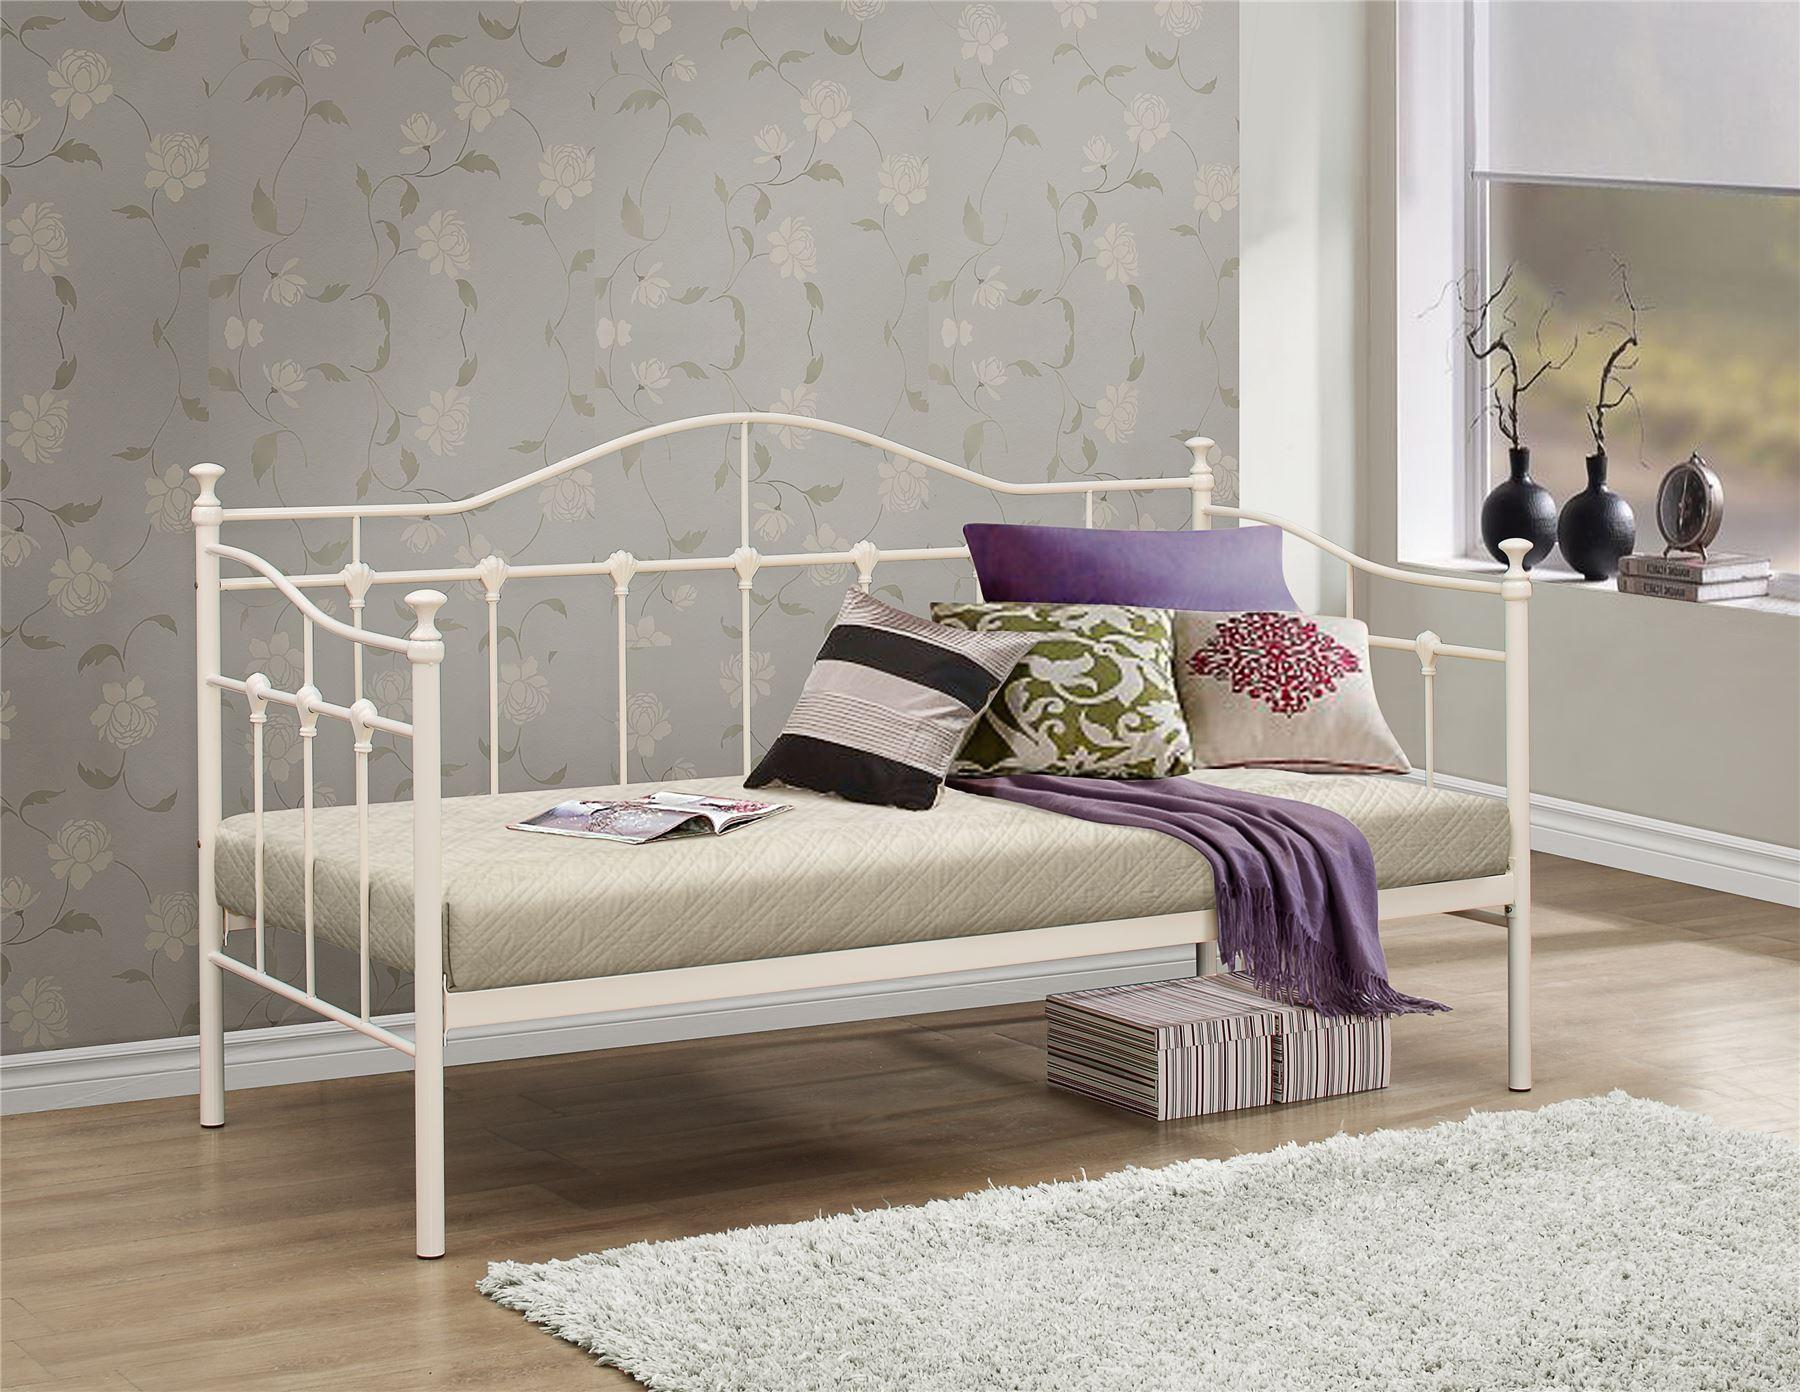 Home Furniture Diy Bed Frames Divan Bases Birlea Torino 90cm 3ft Single Ivory Off White Day Bed Metal Bed Frame Bedstead Bortexgroup Com